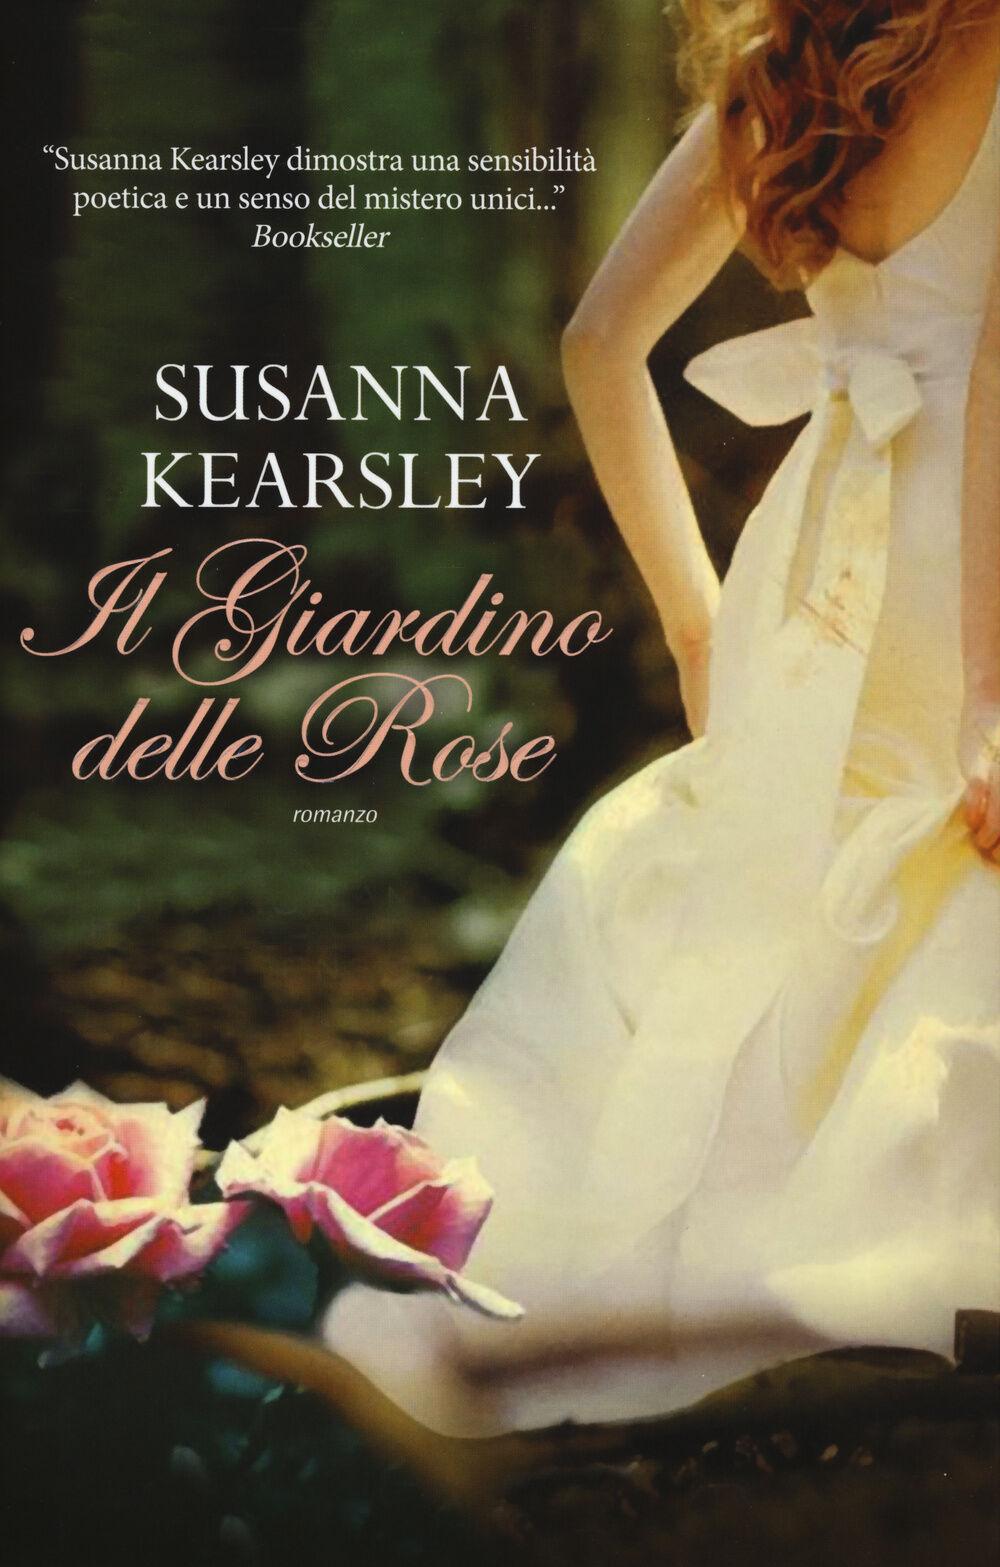 Il giardino delle rose susanna kearsley libro leggereditore narrativa ibs - Il giardino delle rose ...